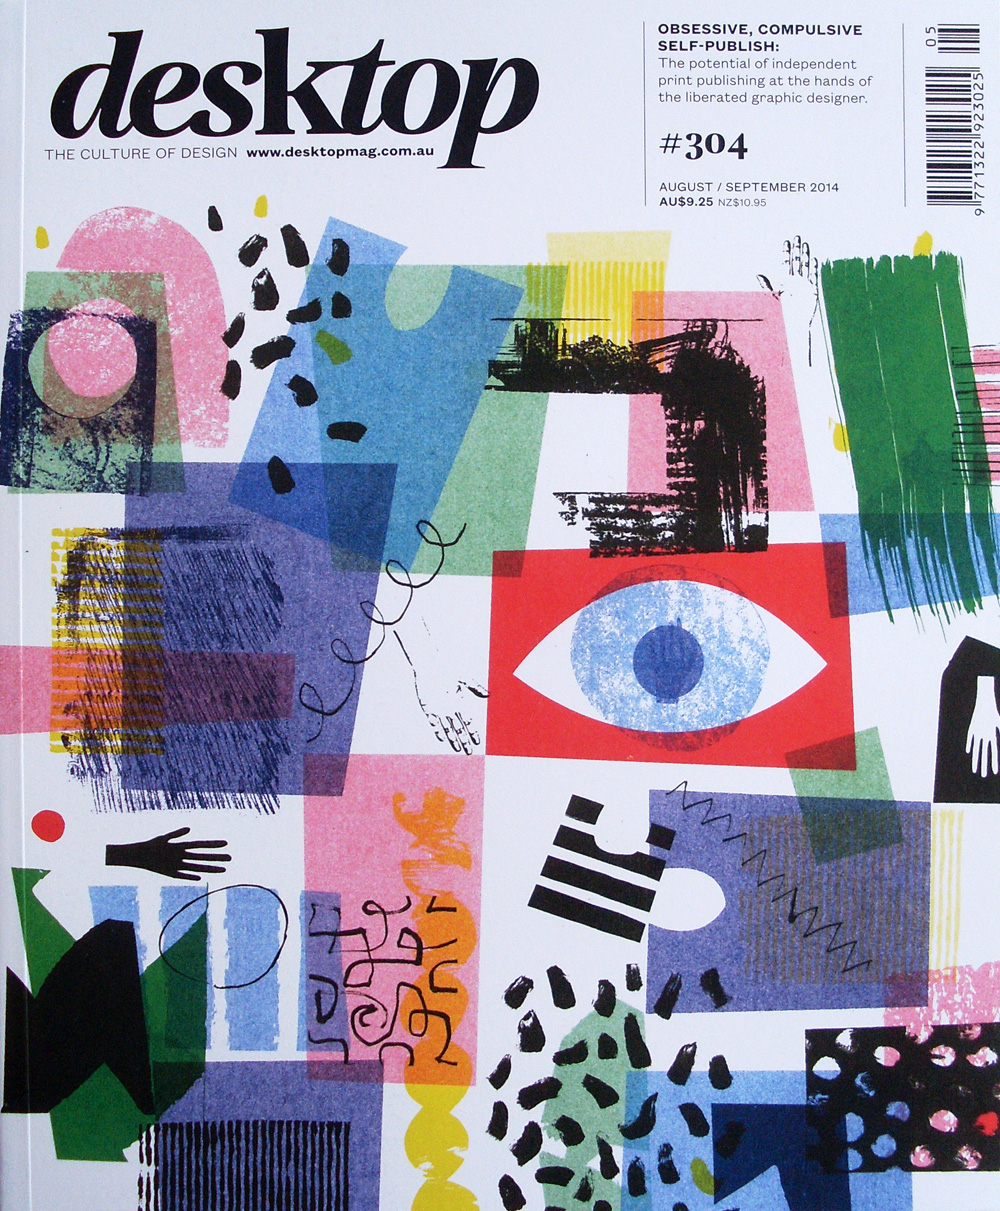 Cover for the Australian Graphic design magazine Desktop